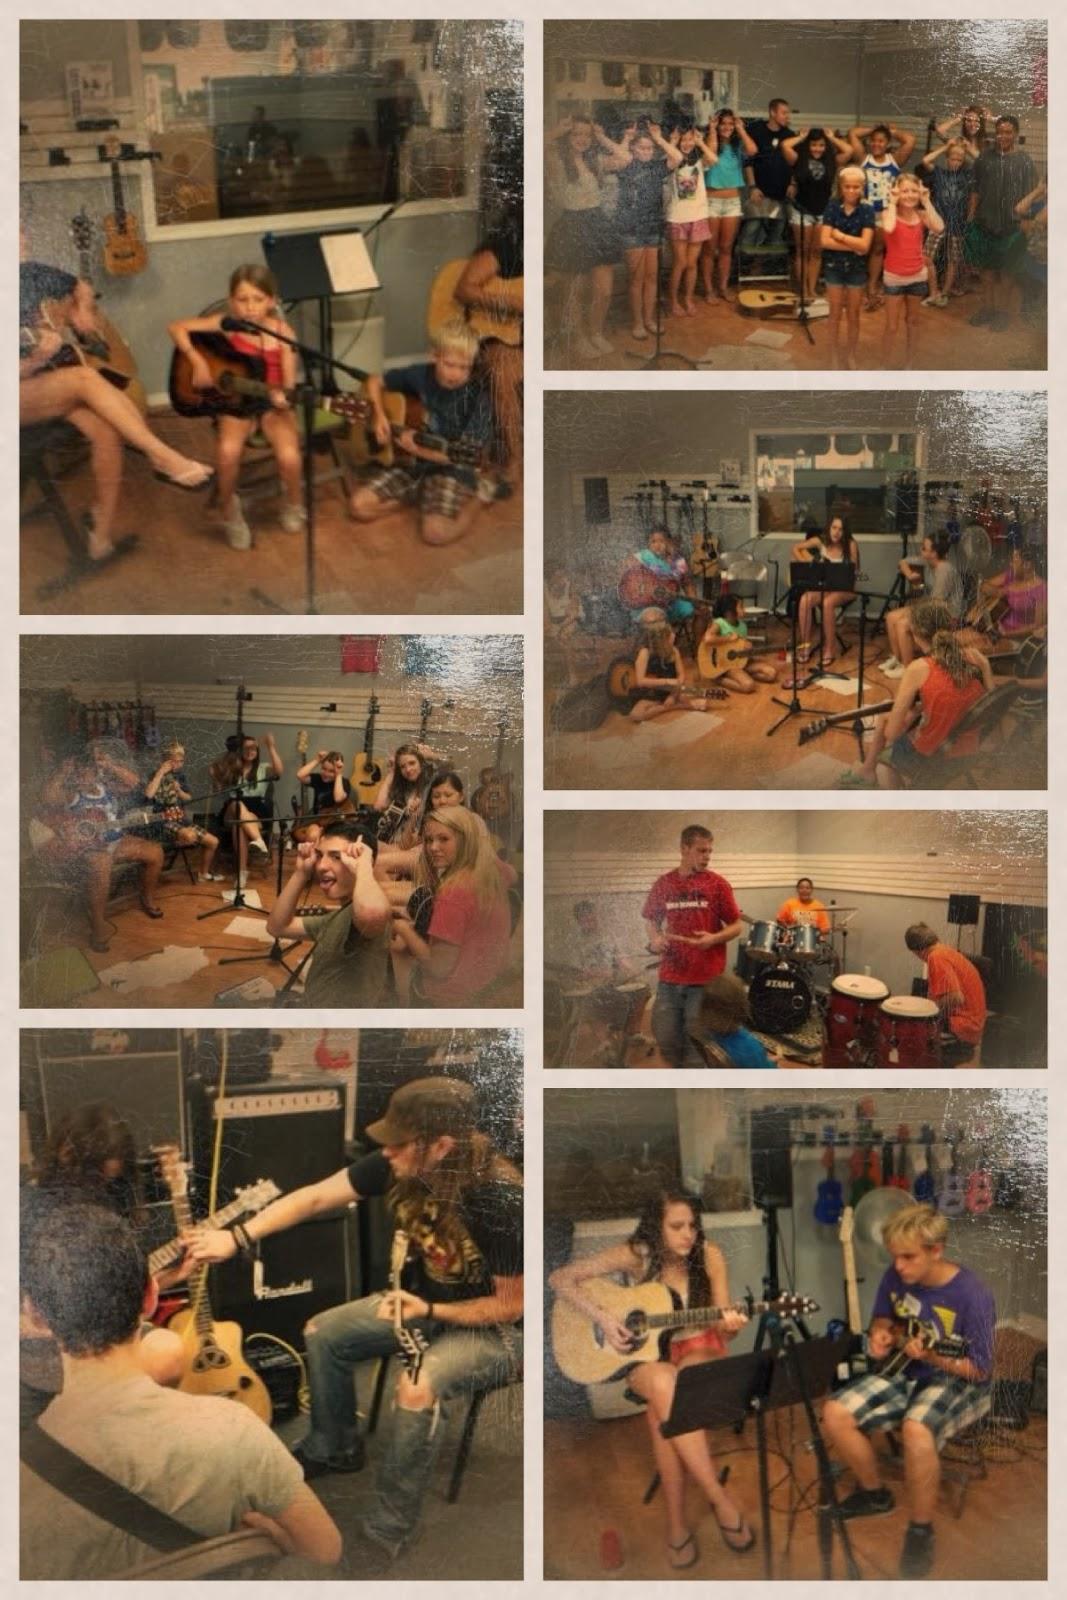 The Drum Room Kansas City